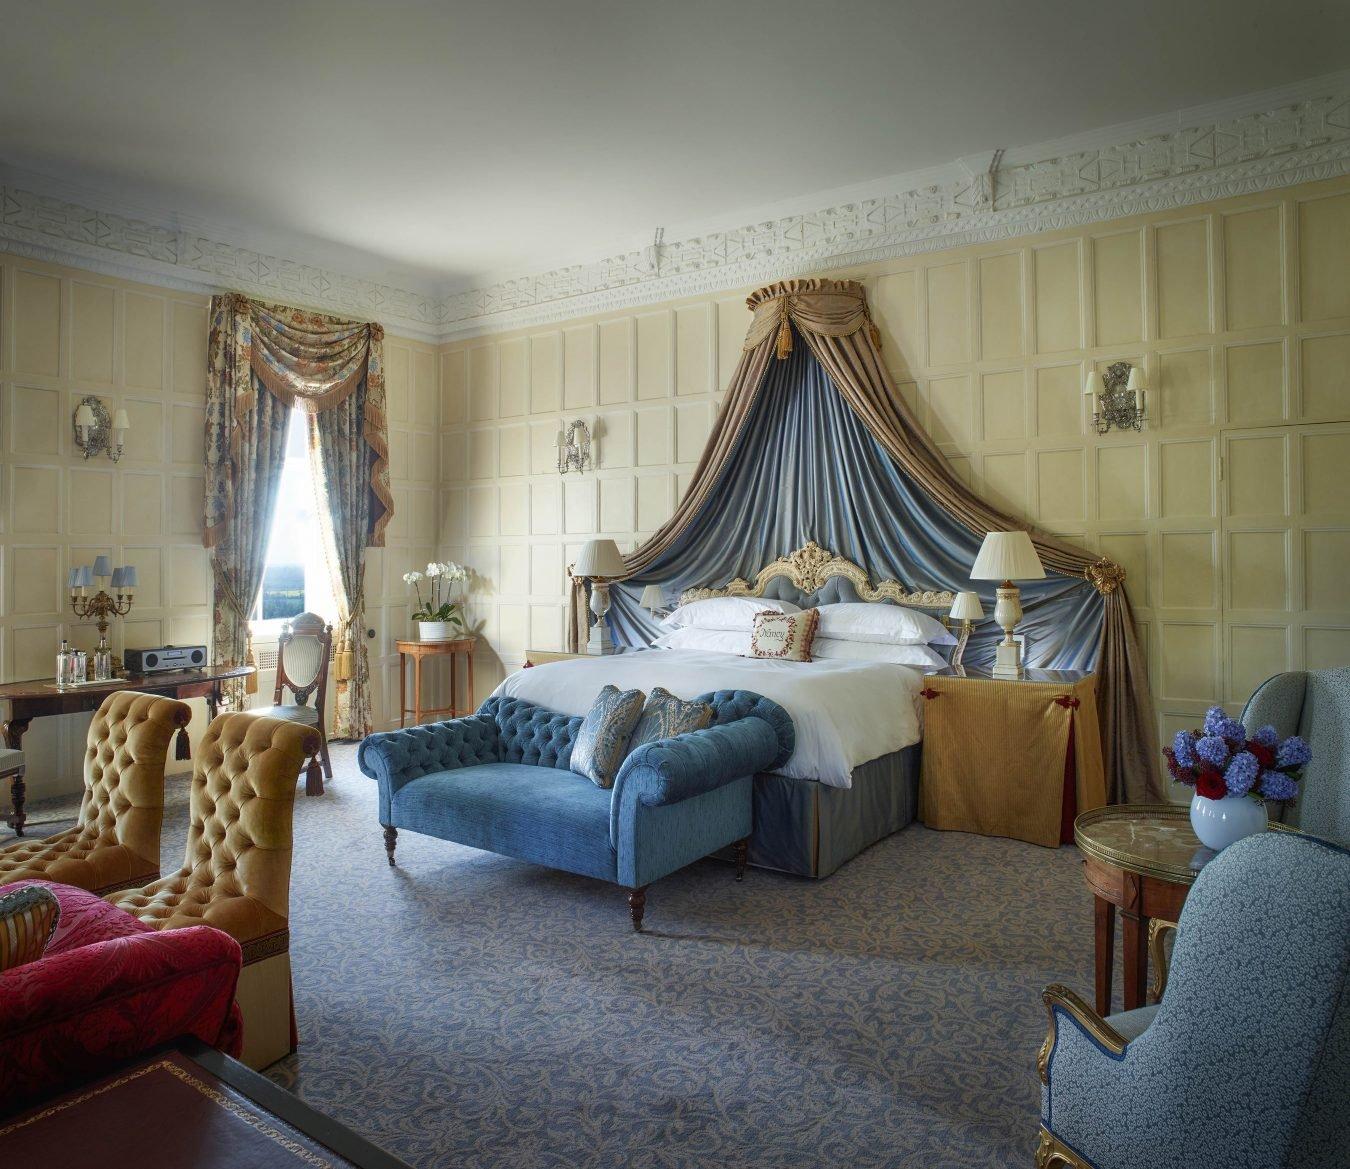 Cliveden House: England's Most Scandalous Hotel